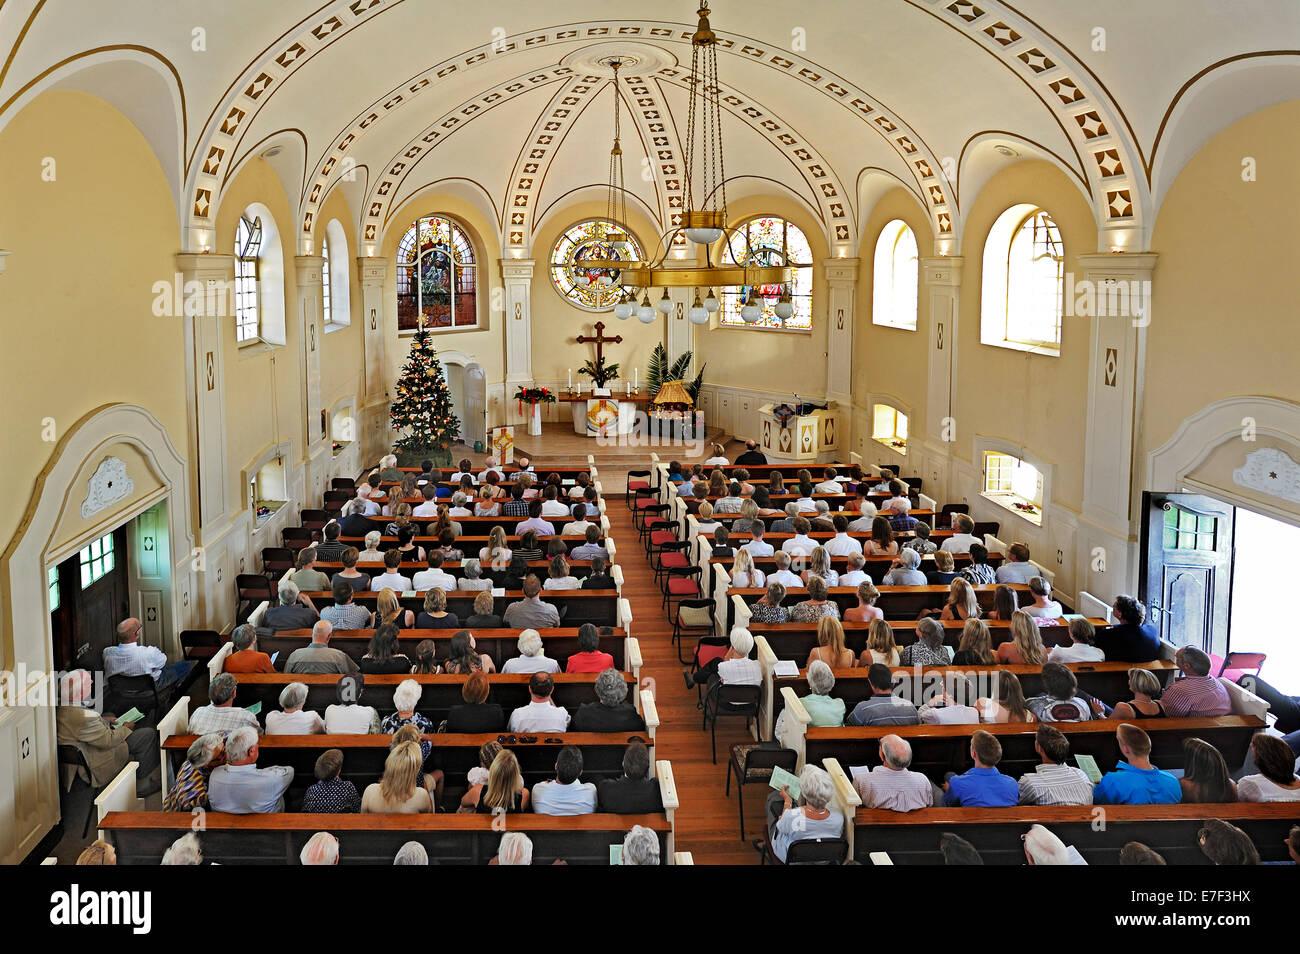 Christmas Mass, Evangelical Lutheran Church, Swakopmund, Namibia - Stock Image